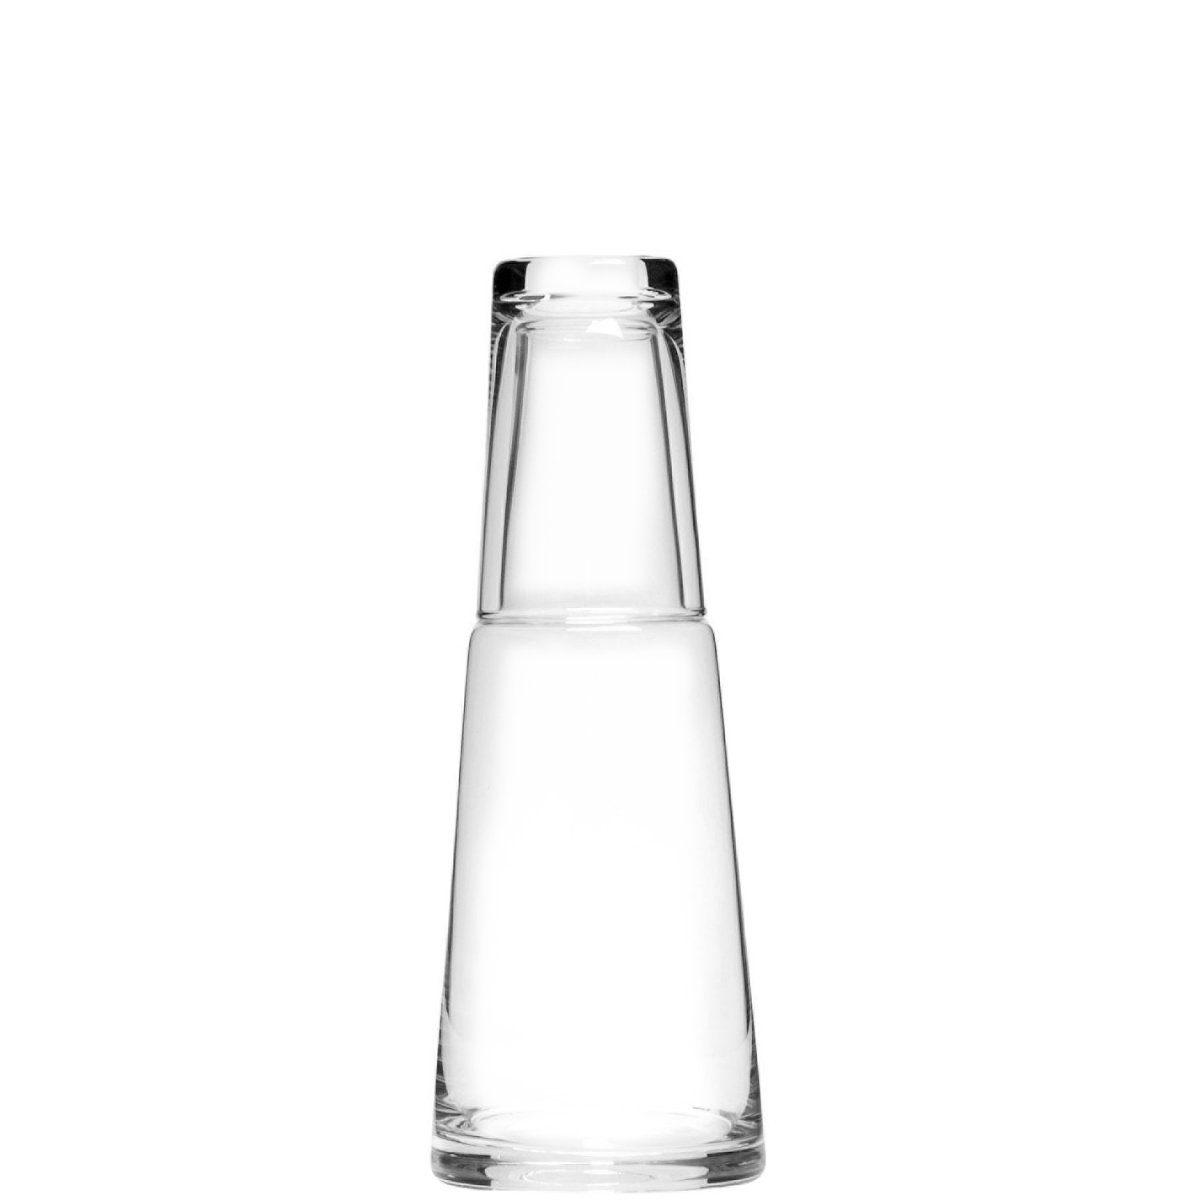 BUTLERS WATER »Glas-Karaffe 800 ml mit Trinkglas«